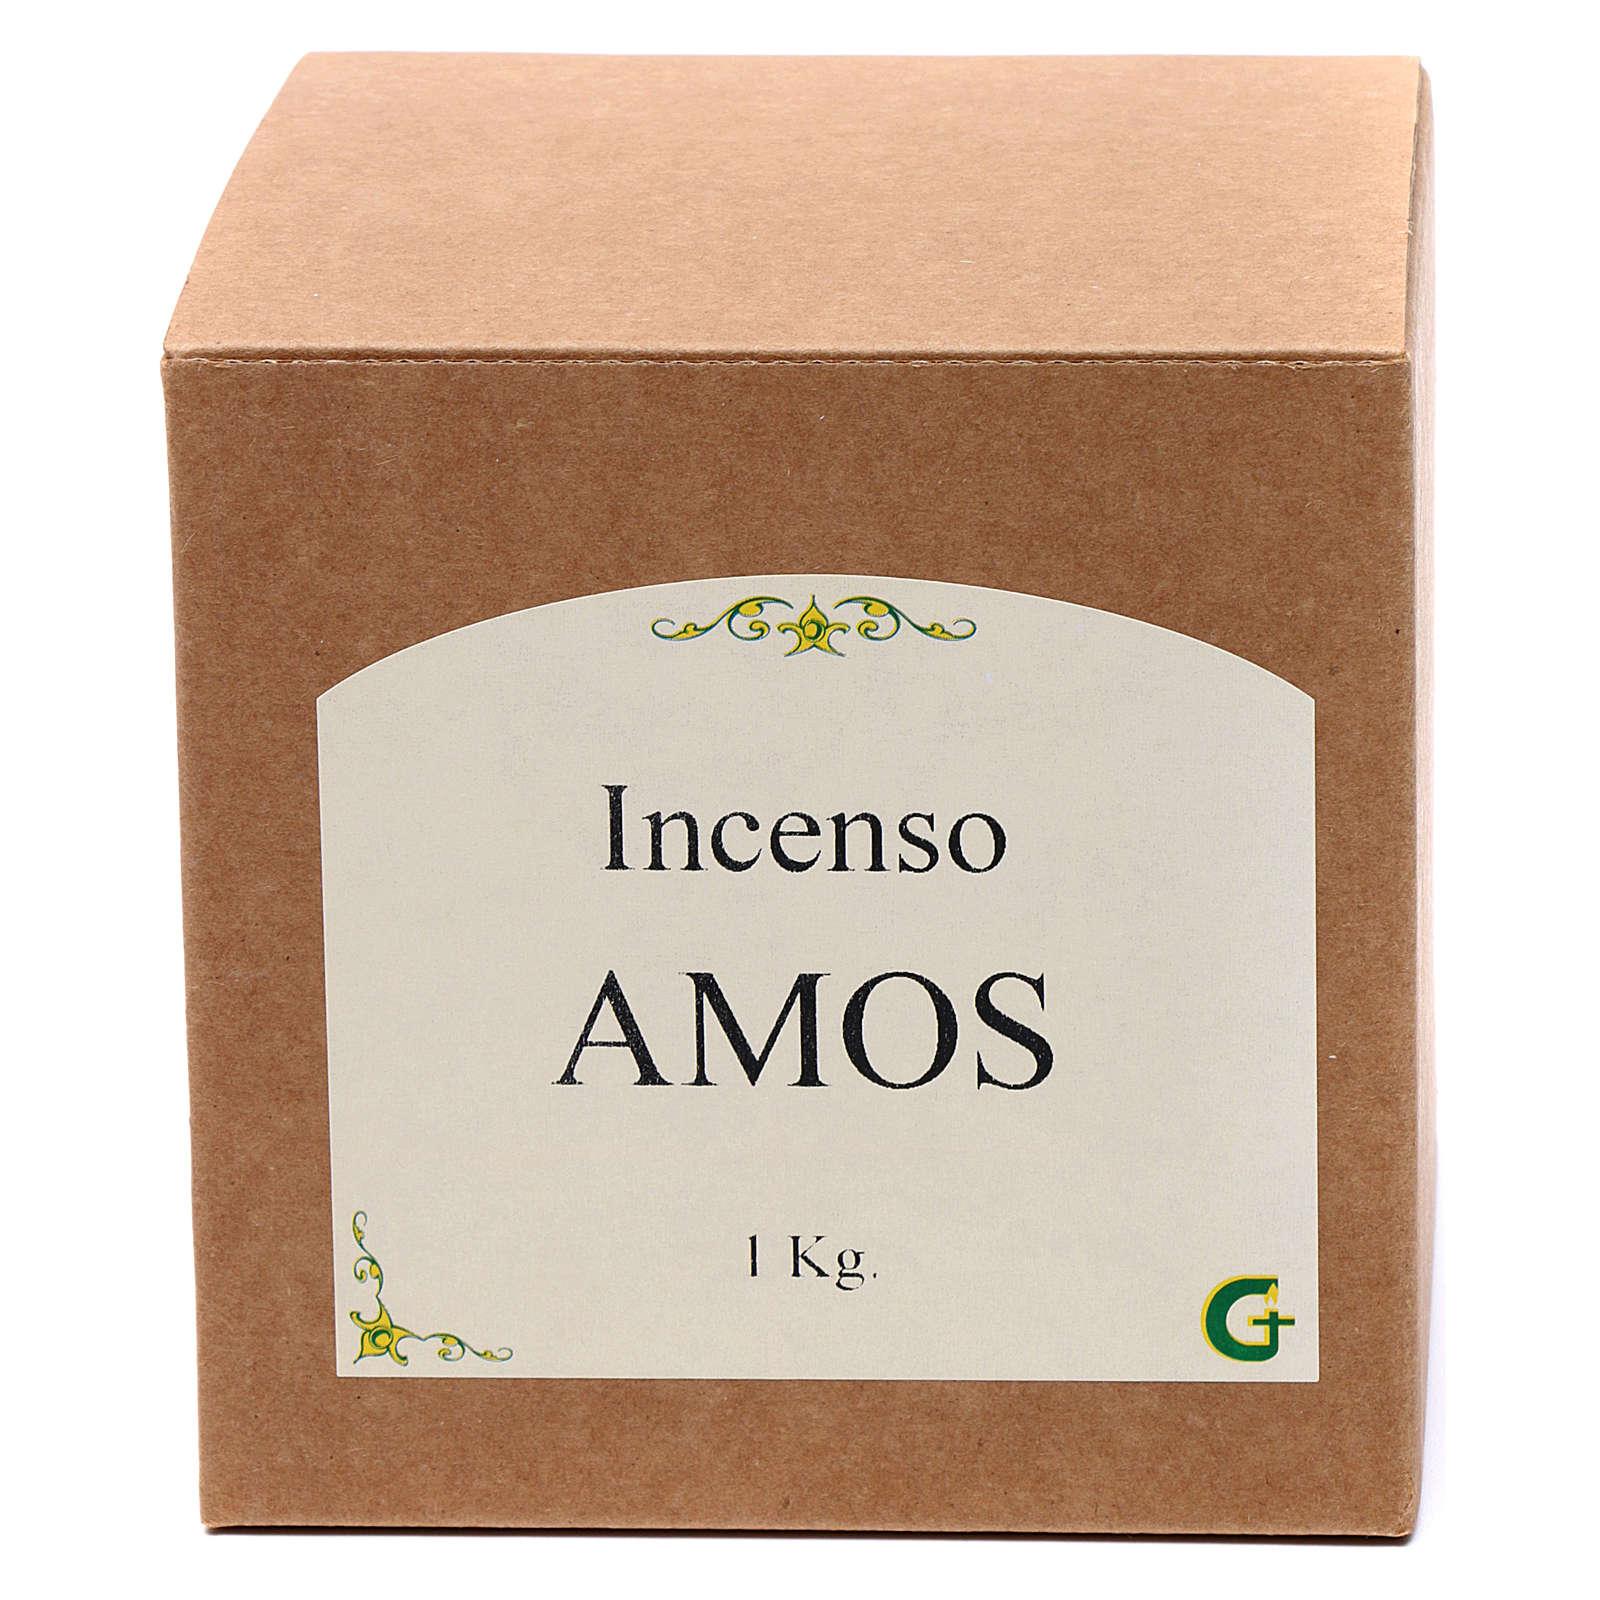 Encens Amos 1 kg 3